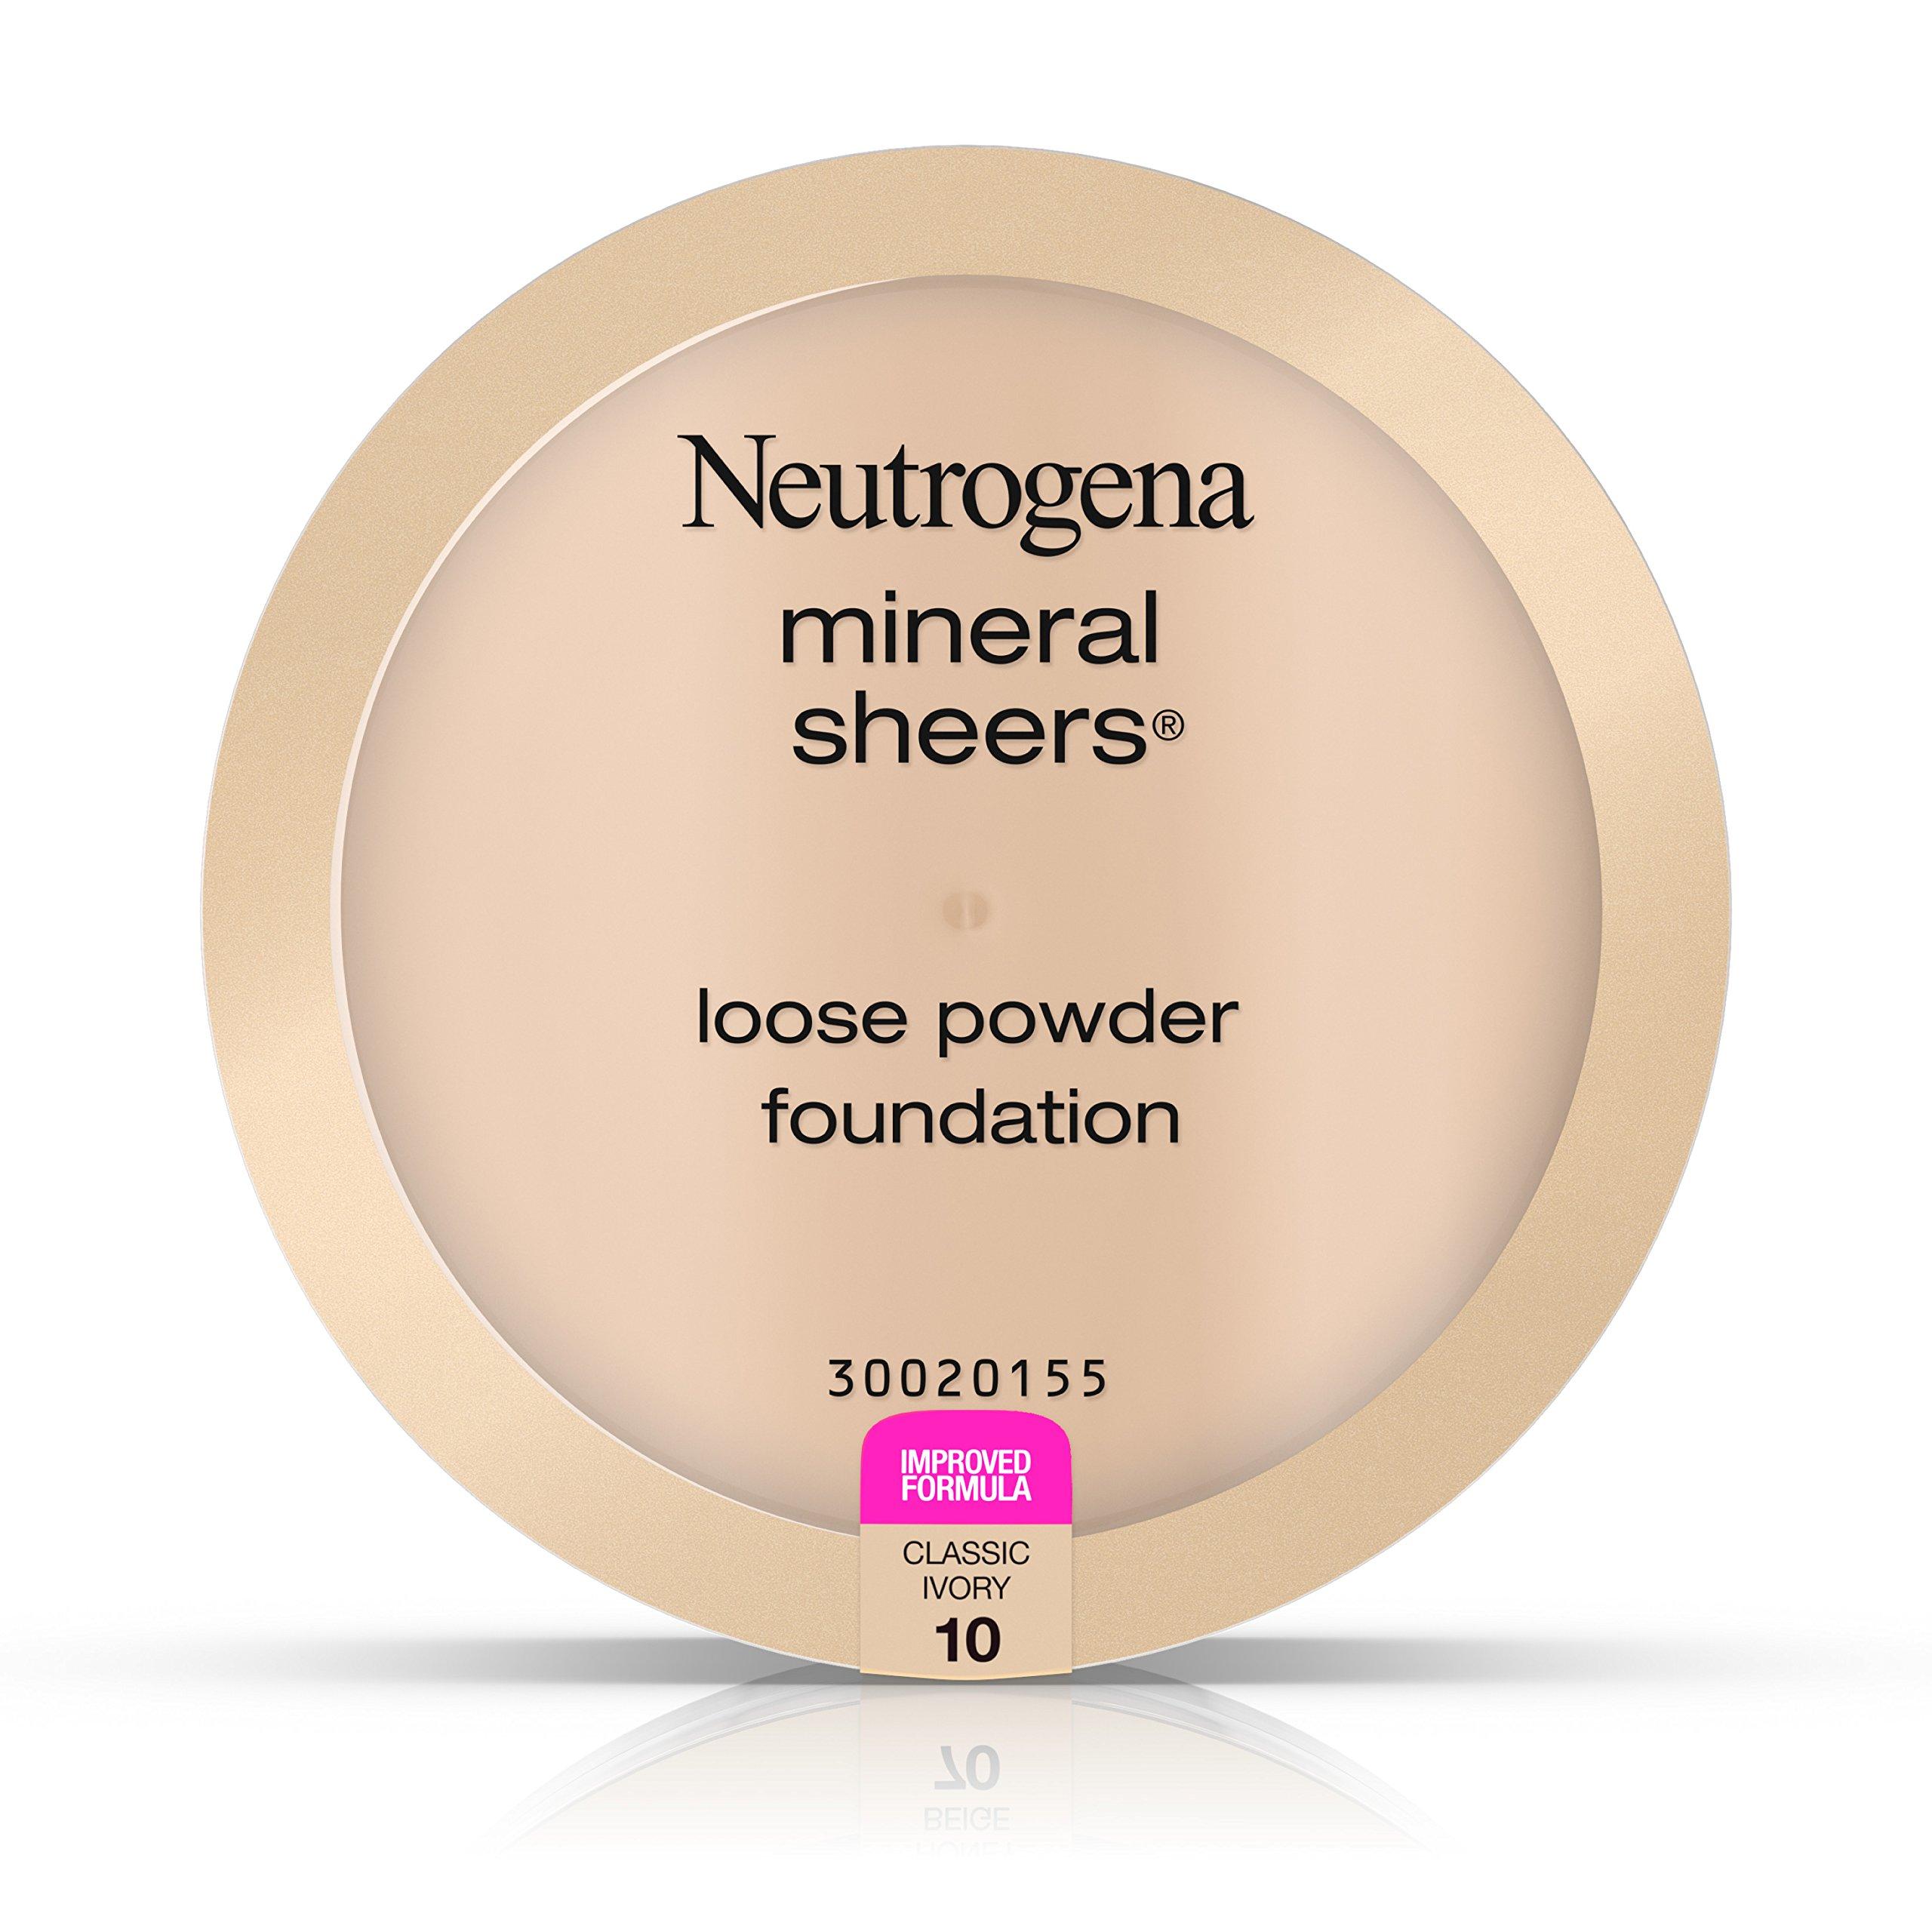 Neutrogena Mineral Sheers Loose Powder Foundation, Classic Ivory 10.19 Oz.